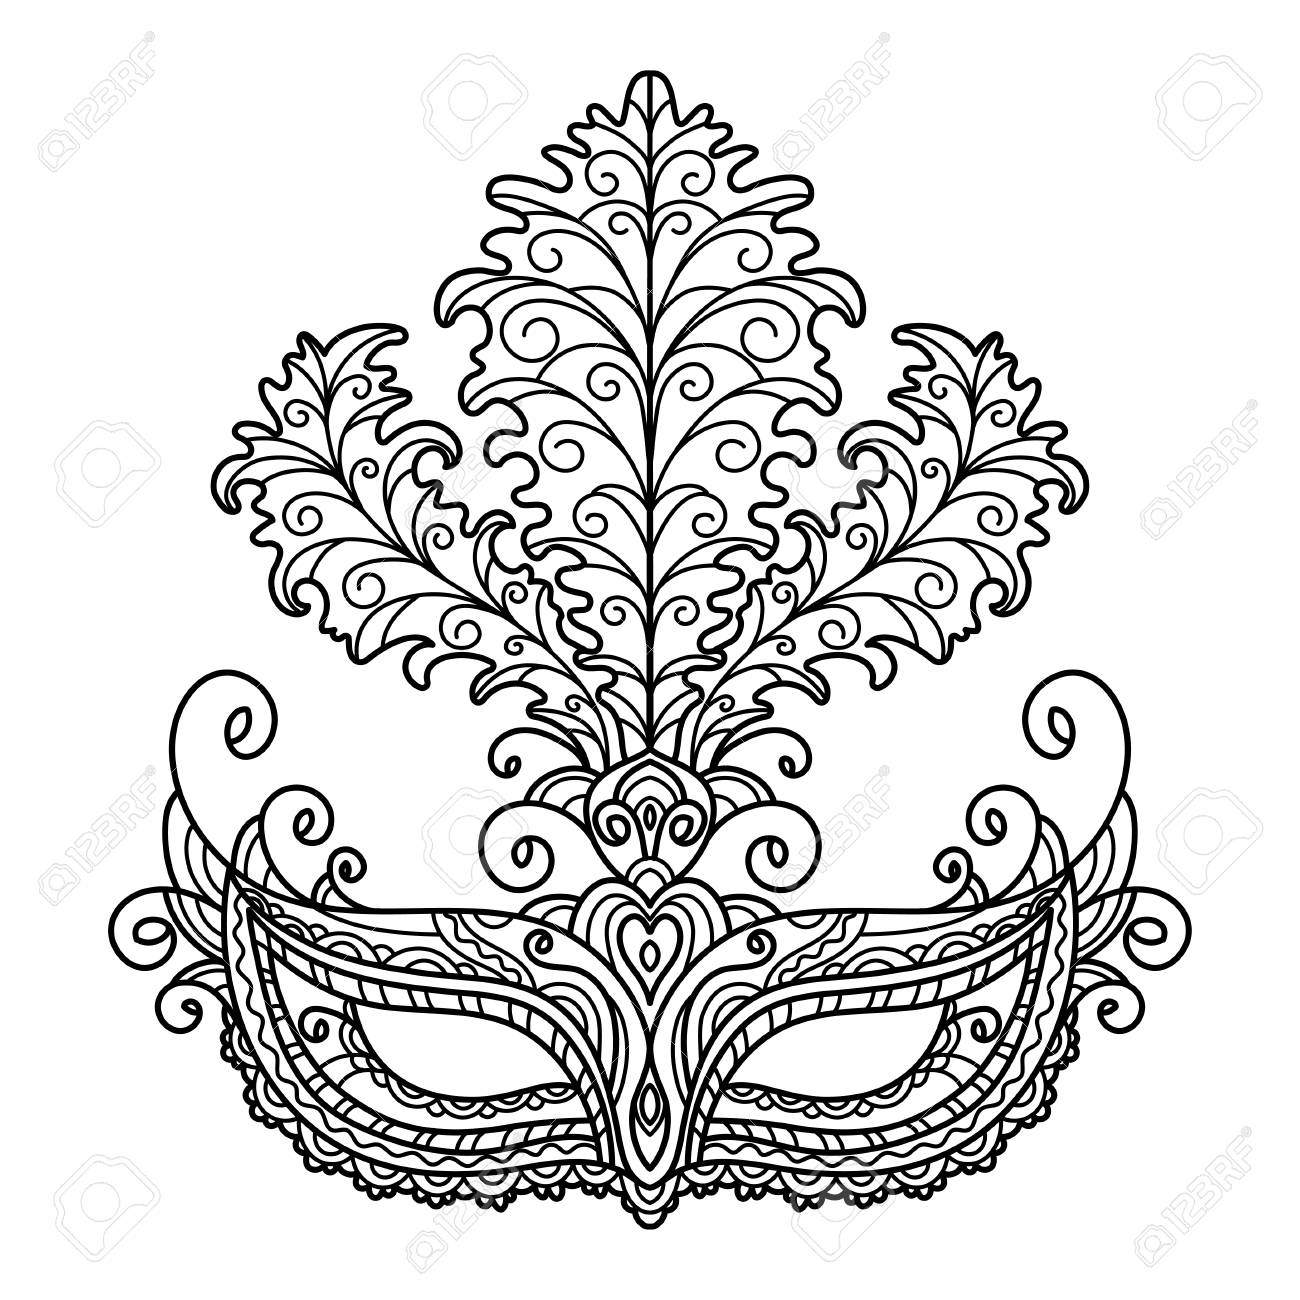 Vector, Black And White Illustration, Outline, Mask, Masquerade ...